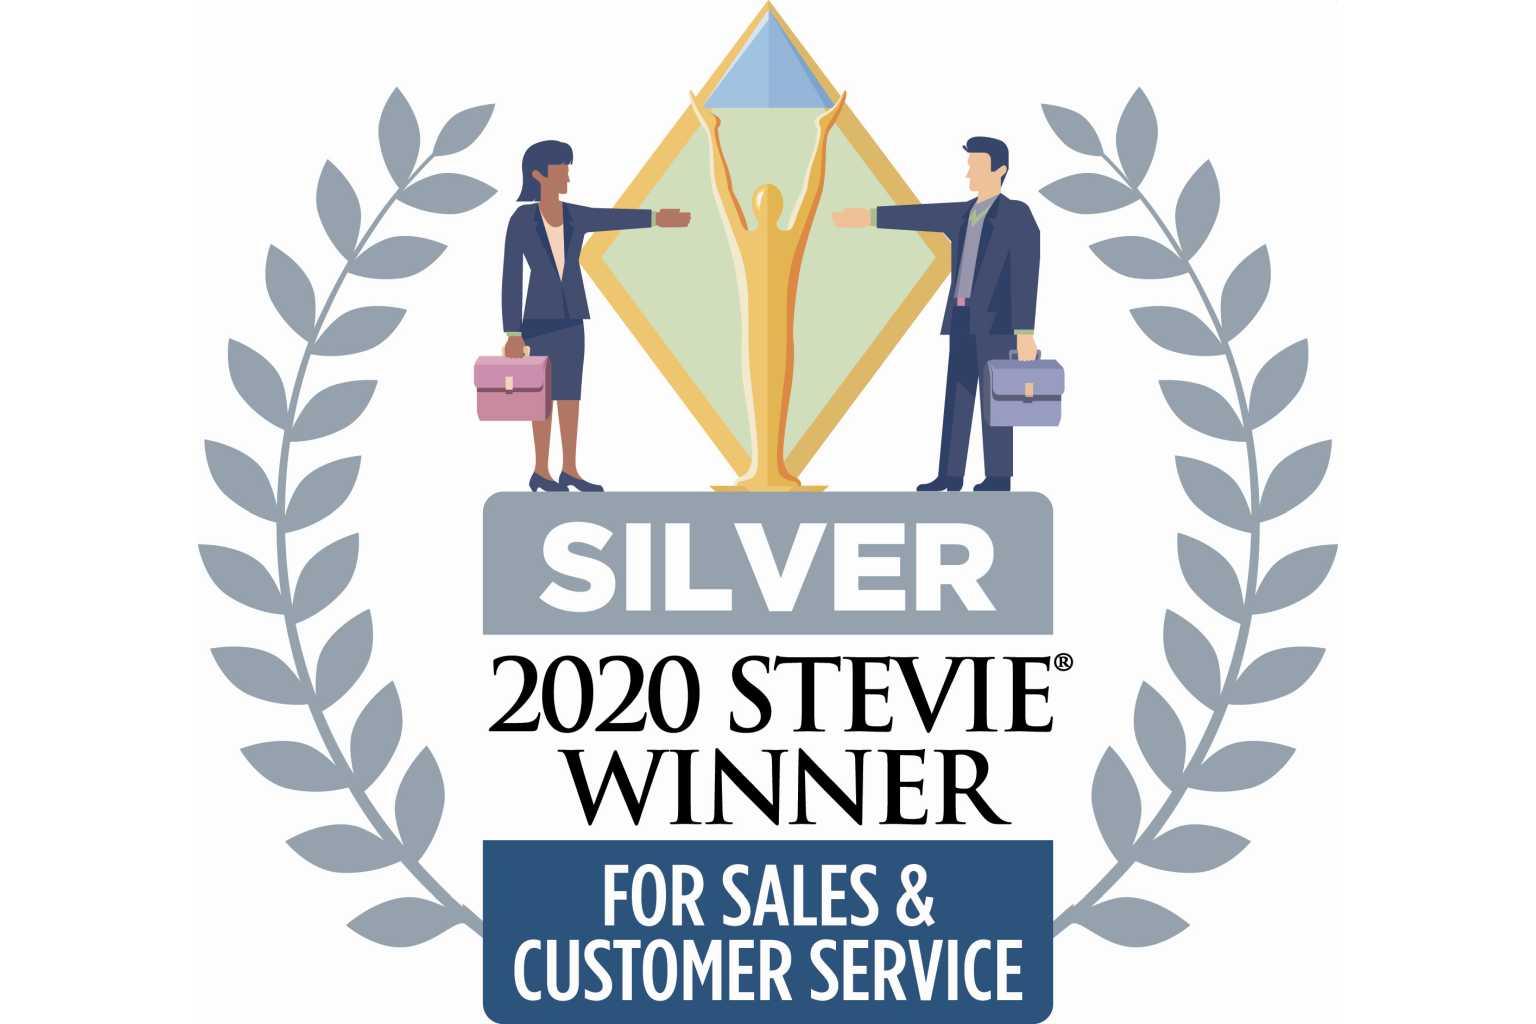 CT Corporation wins Stevie Customer Service Award